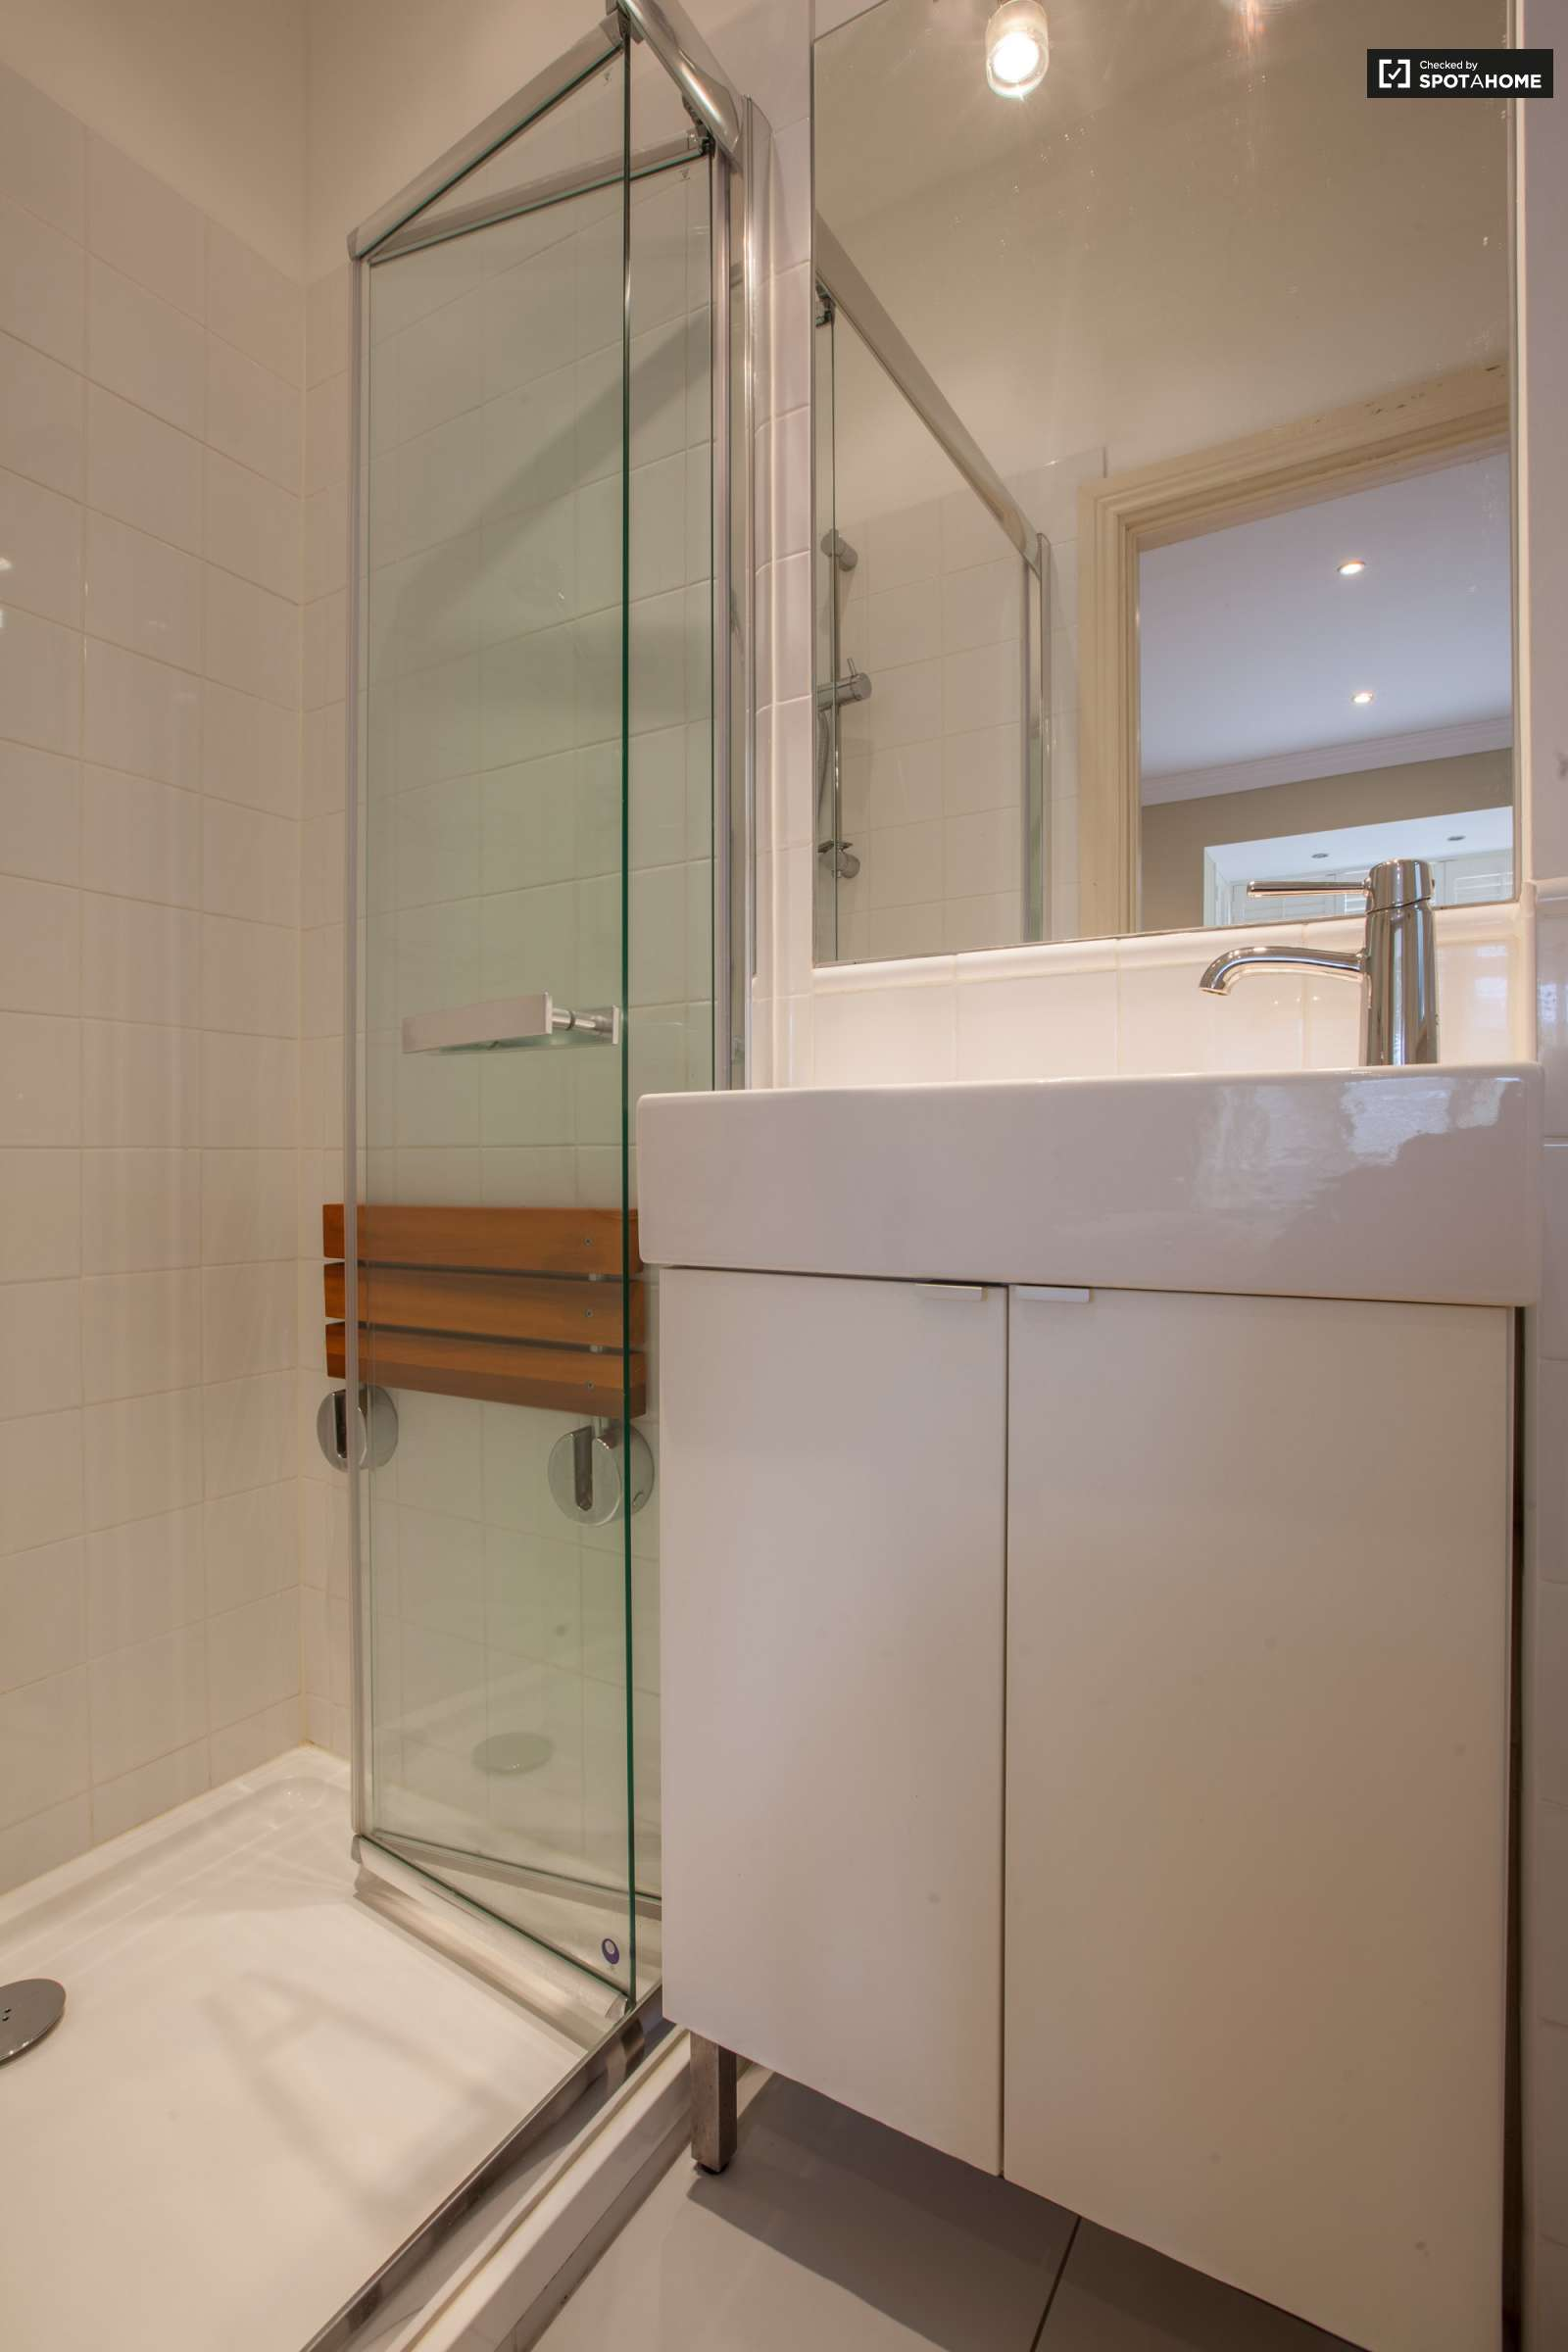 Studio apartment for rent in Sandycove, Dublin | Rent ...